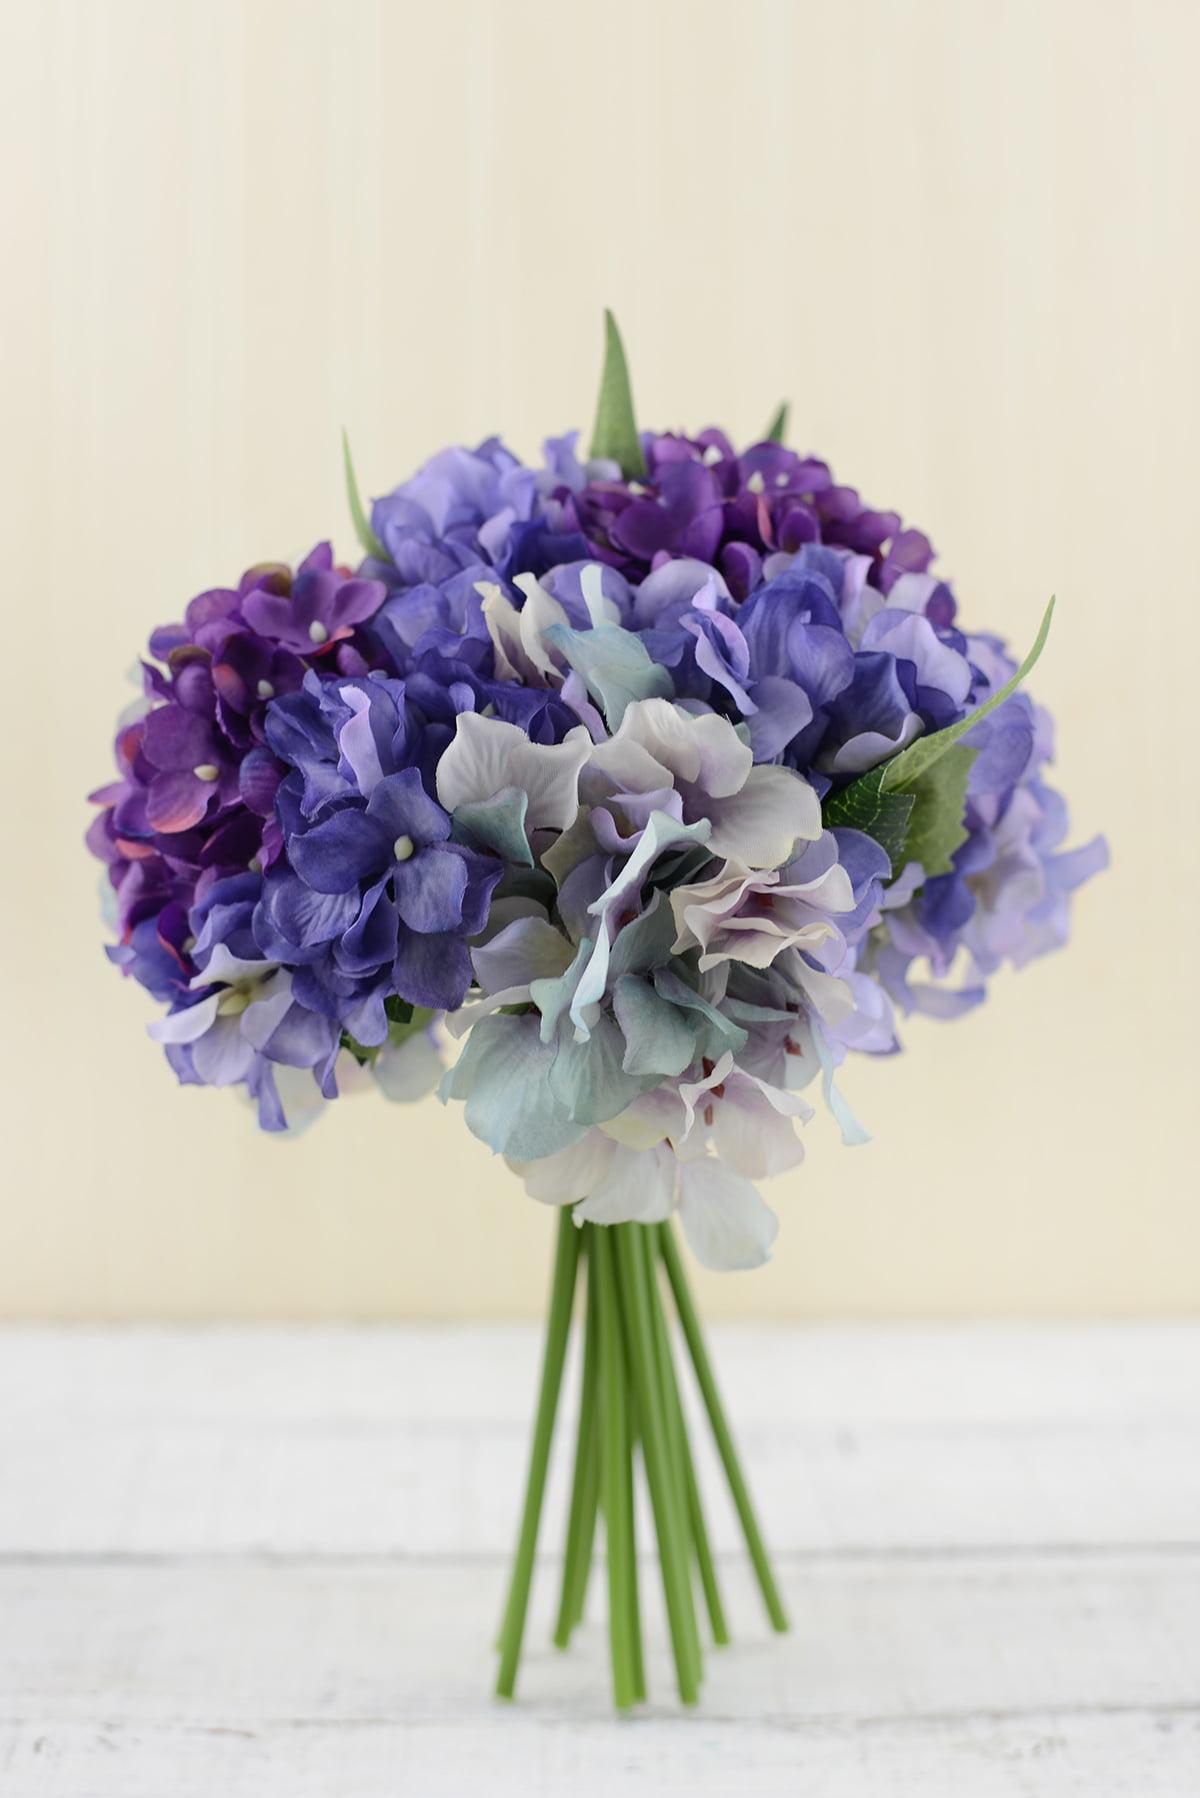 Hydrangea Bouquet Purple 9.5 inches - Walmart.com